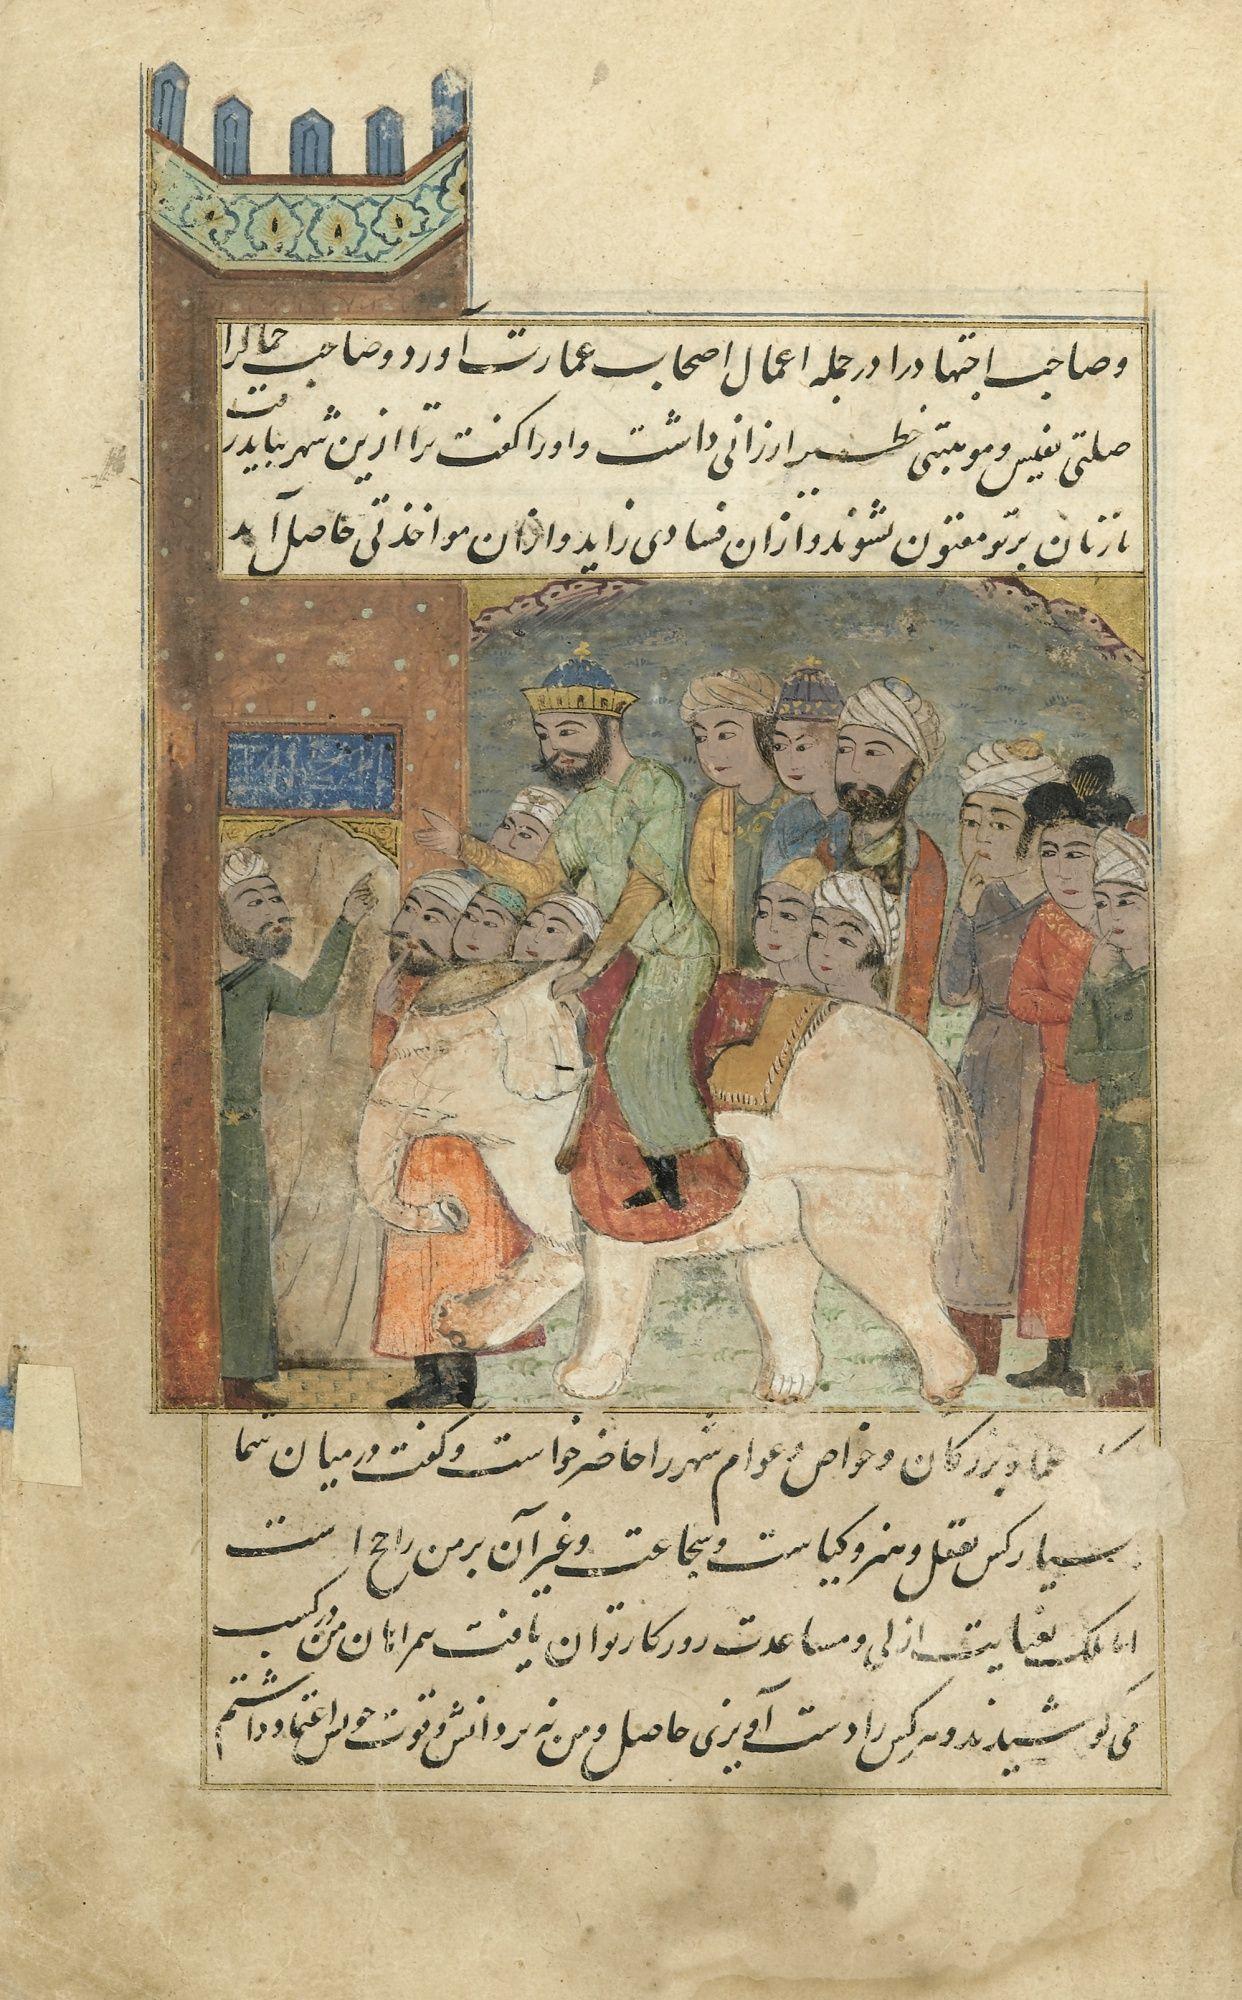 ABU'L MA'ALI NASRALLAH MUNSHI: KALILA WA DIMNA, SIGNED AND DATED: 850H./1446-47, TIMURID PERSIA, 15TH CENTURY